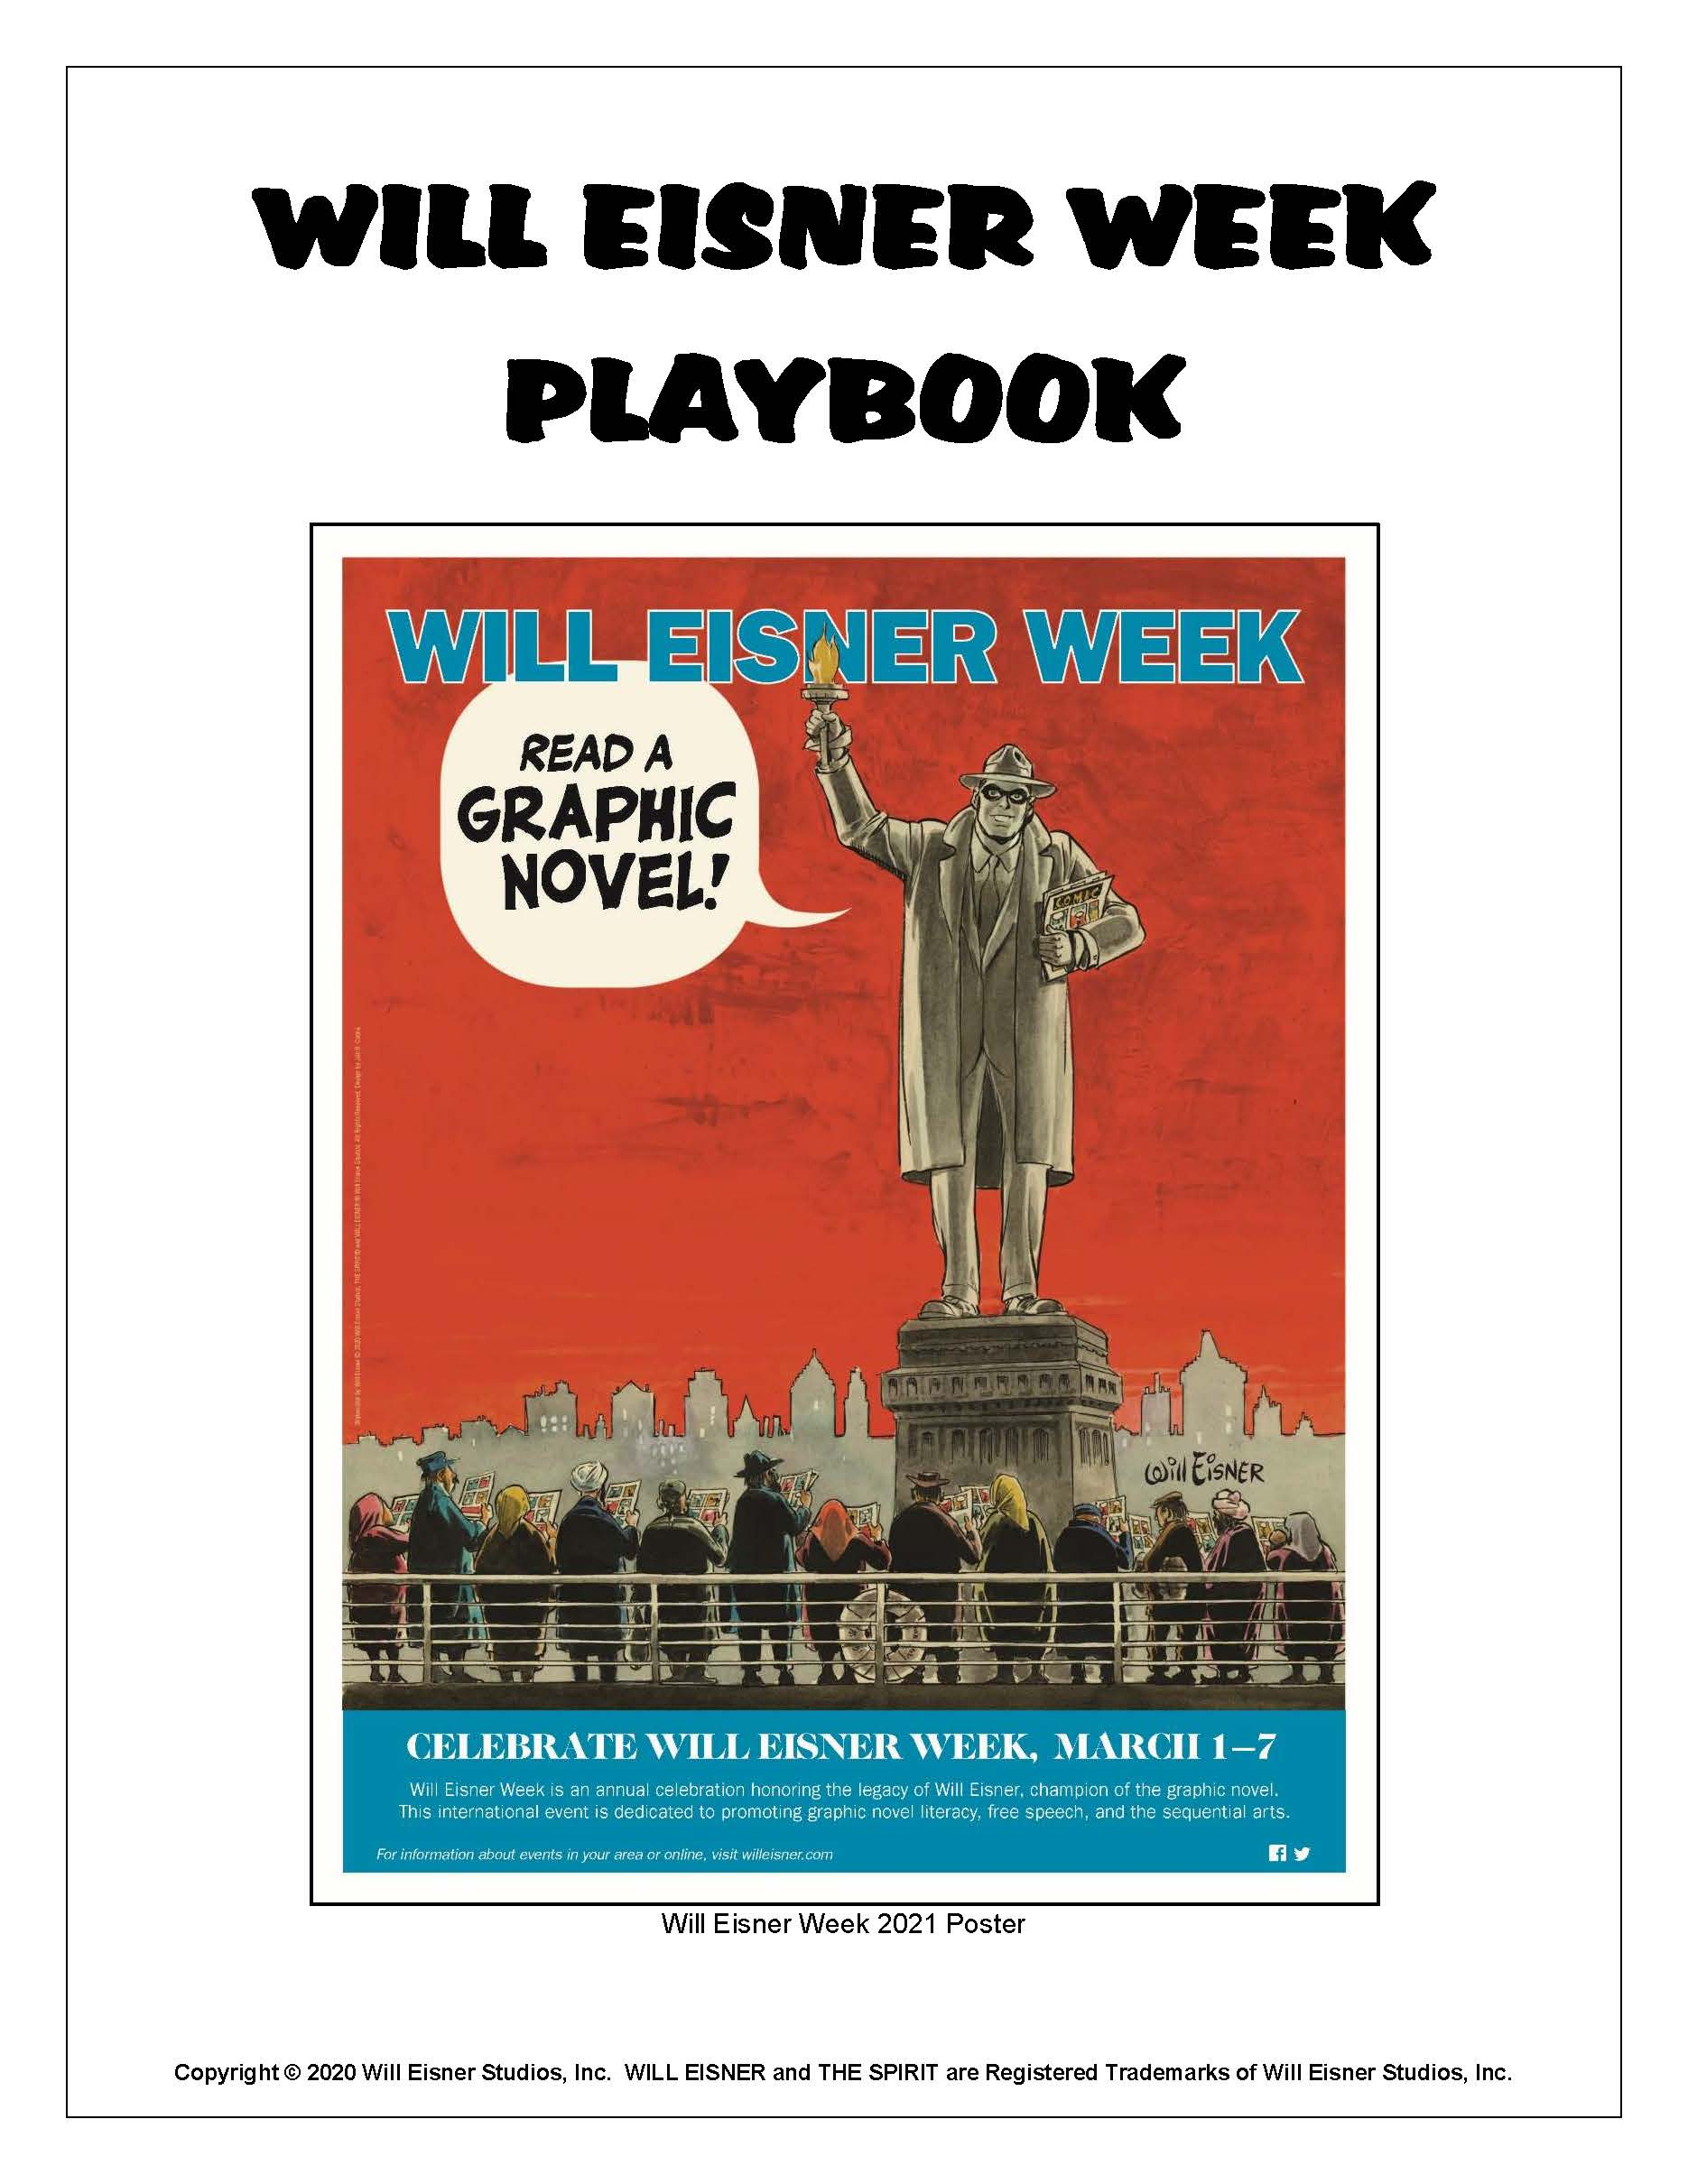 "<div style=""text-align: center;""></div> Download a Playbook<a href=""https://mcusercontent.com/71edc894e2163d77faf5b4392/files/a16182b0-5ff1-4b32-8363-bd505cbd21ed/WEFF_WEW2021_Playbook.pdf"" rel=""nofollow"" target=""_blank"">HERE</a>."